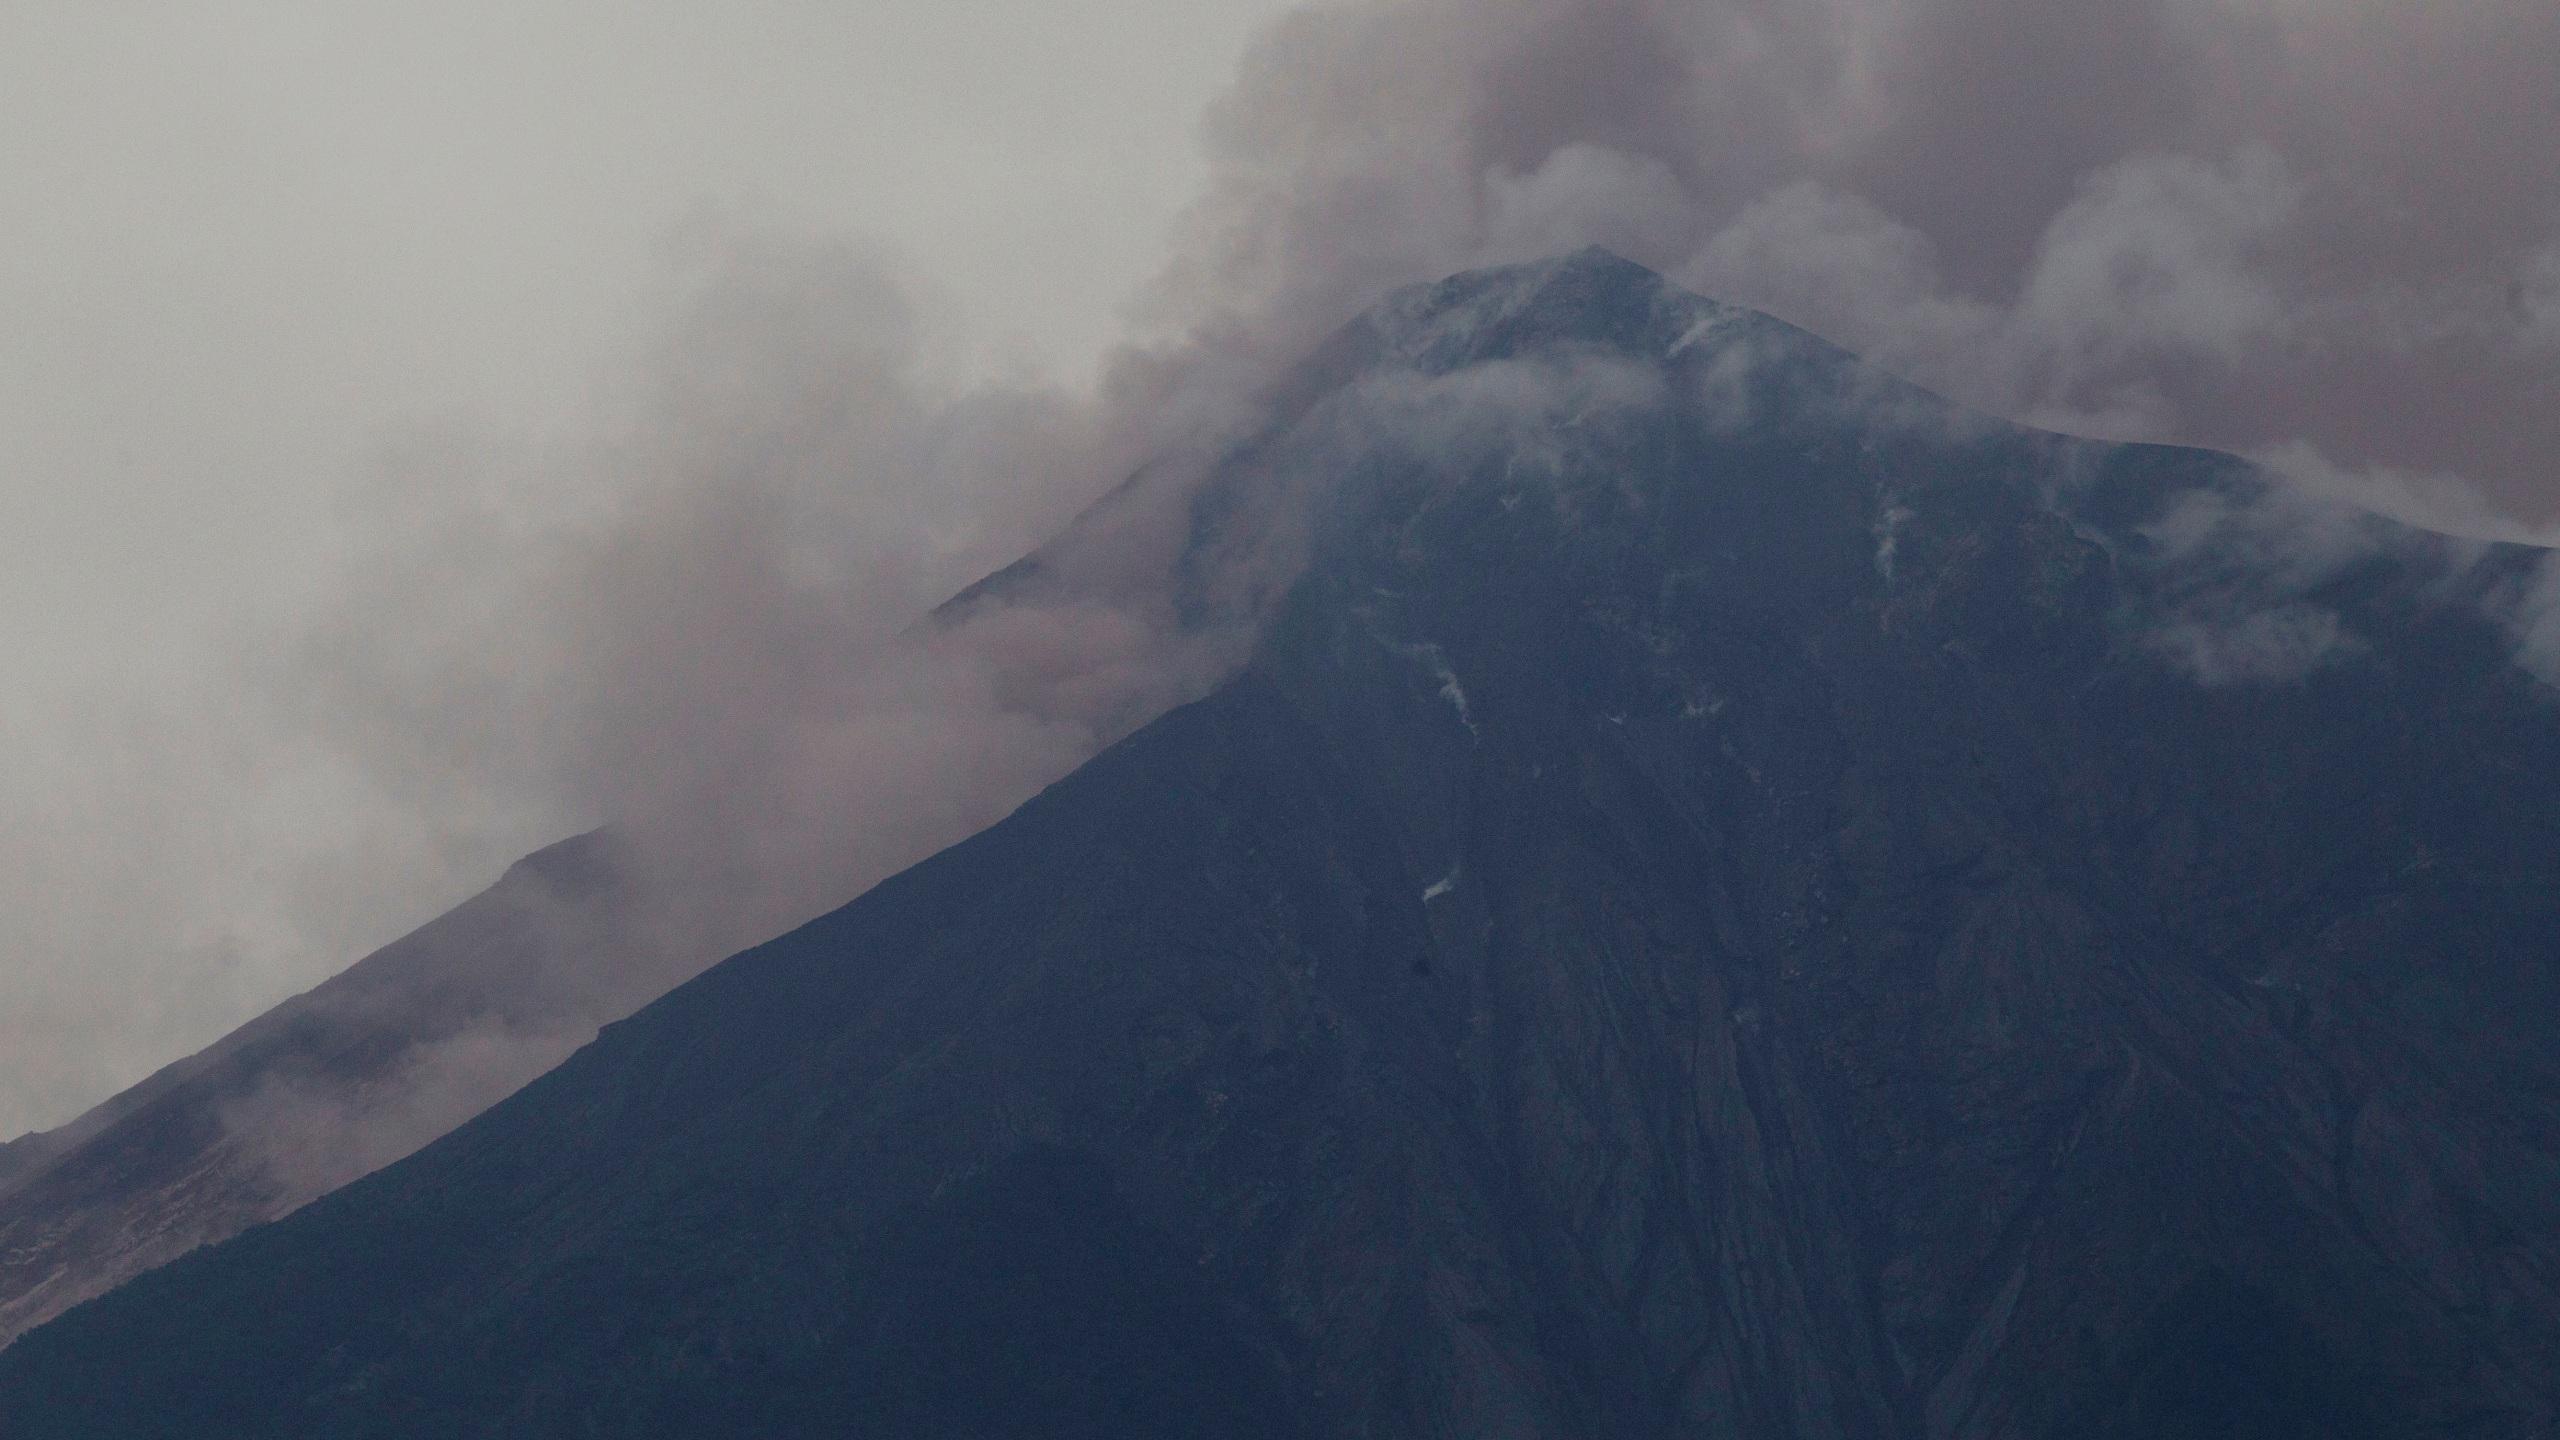 APTOPIX_Guatemala_Volcano_99999-159532.jpg36108180